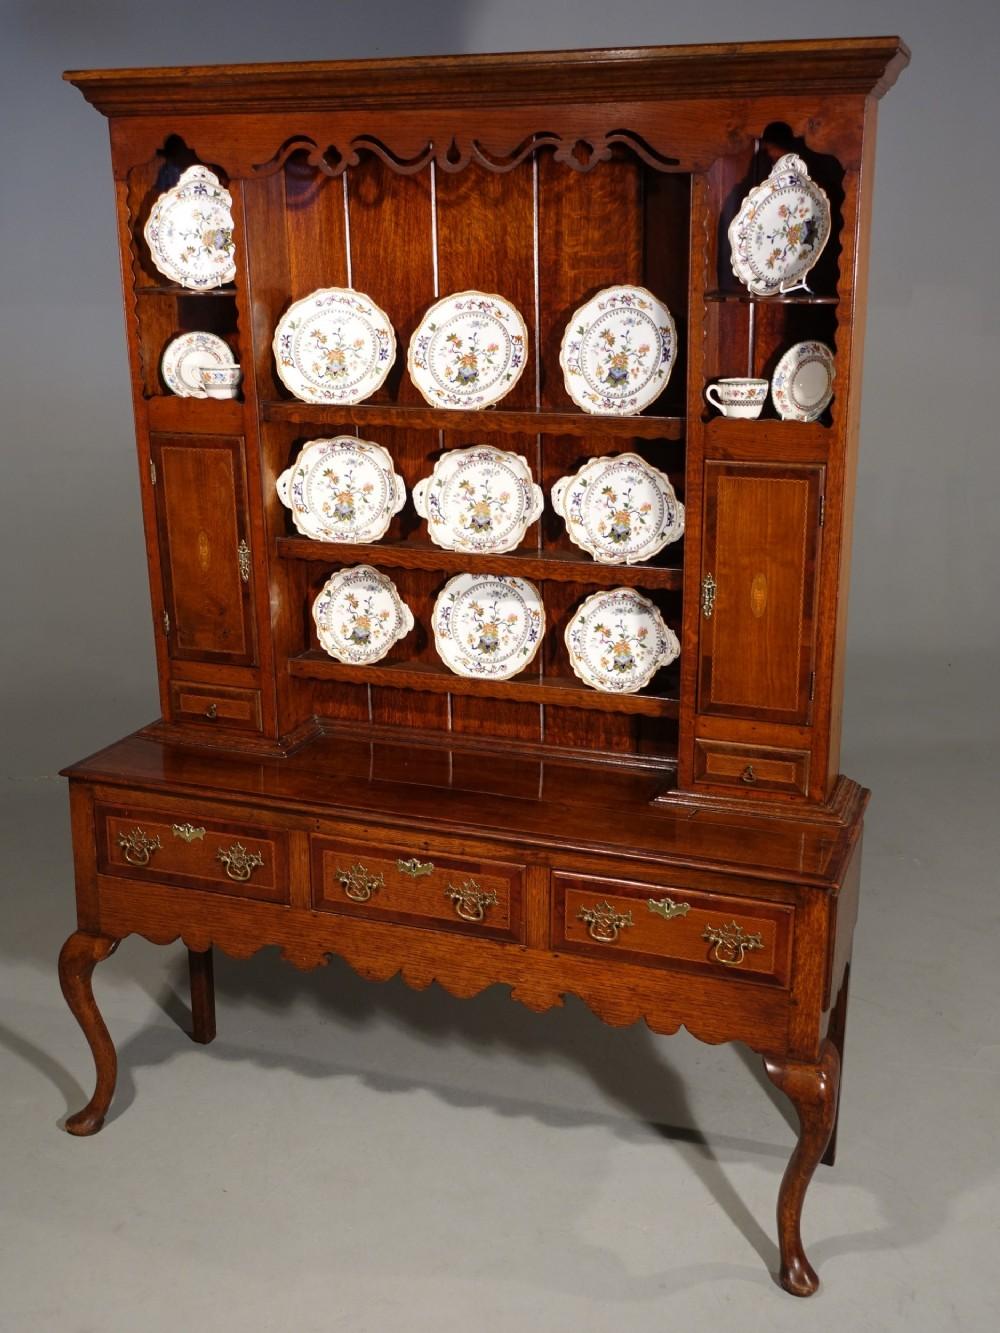 a fine quality late 19th century oak dresser and rack